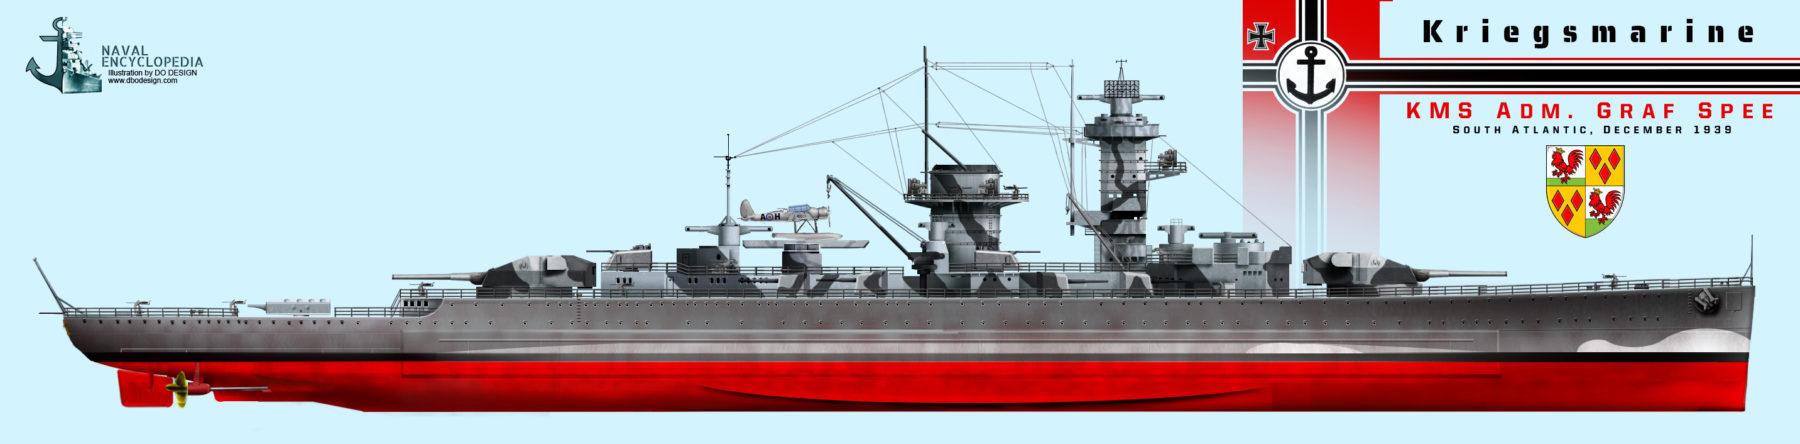 KMS Admiral Graf Spee, South Atlantic December 1939